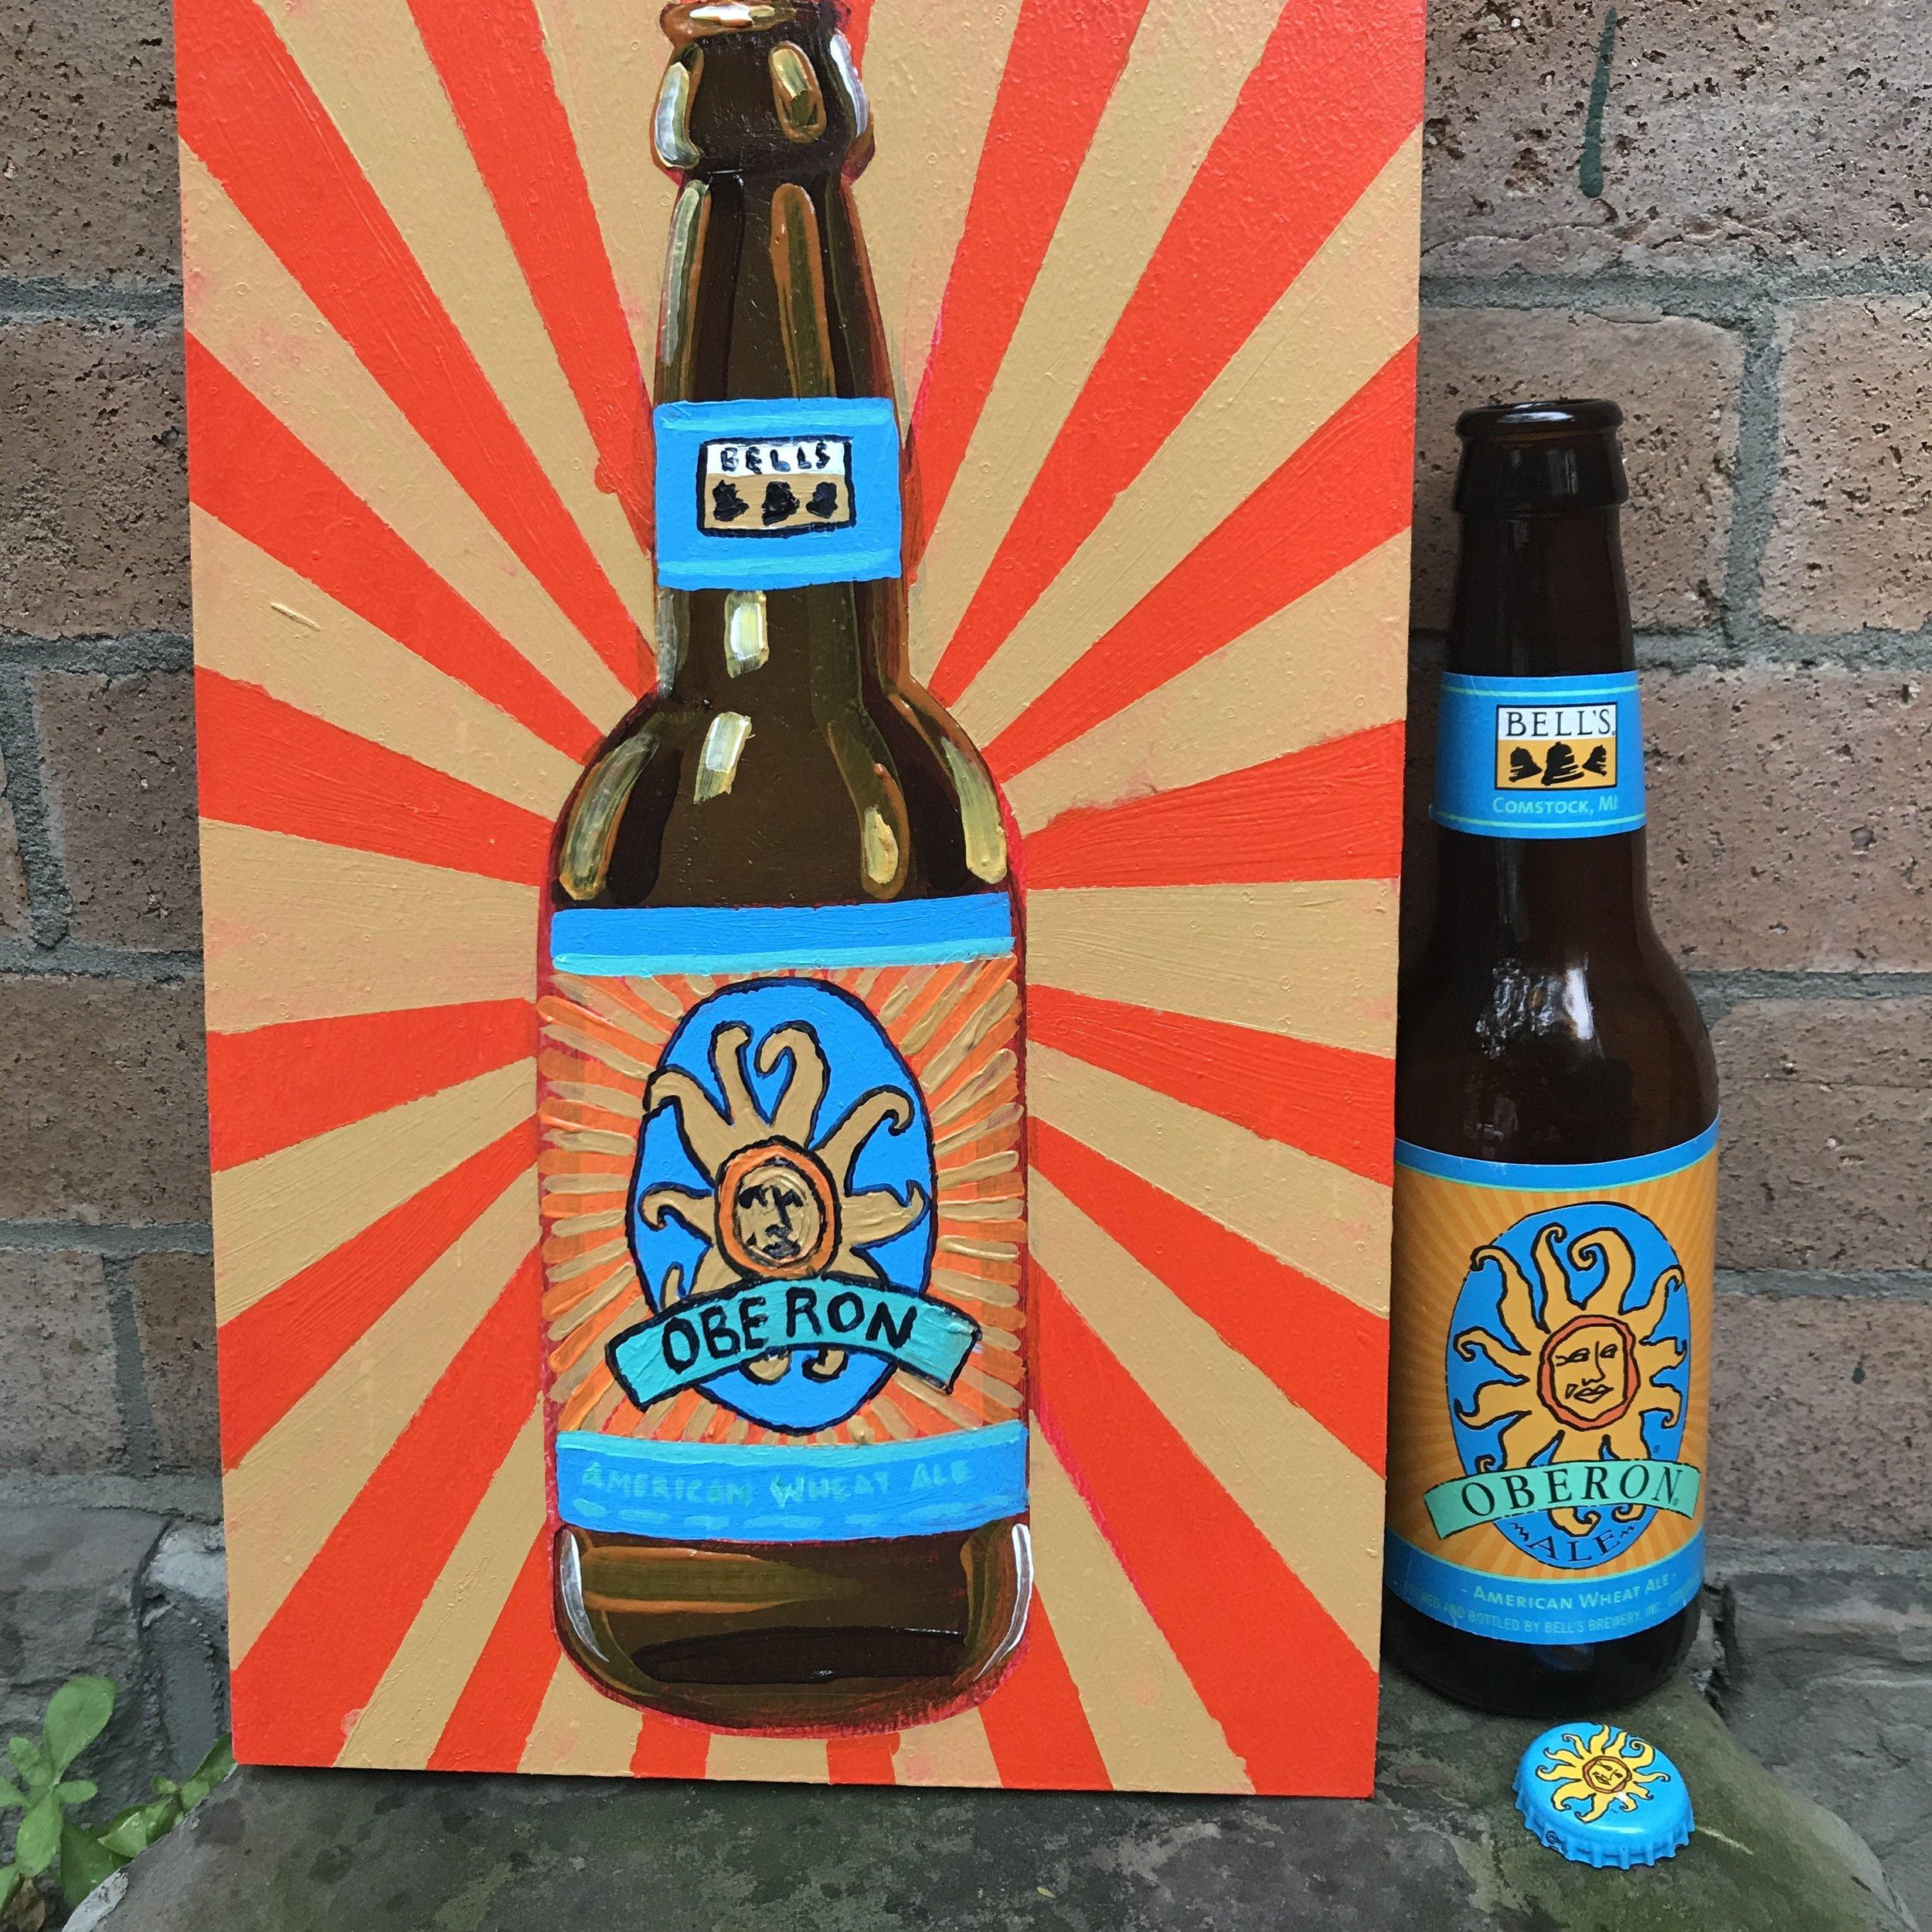 29 Bell's Oberon Ale (USA)